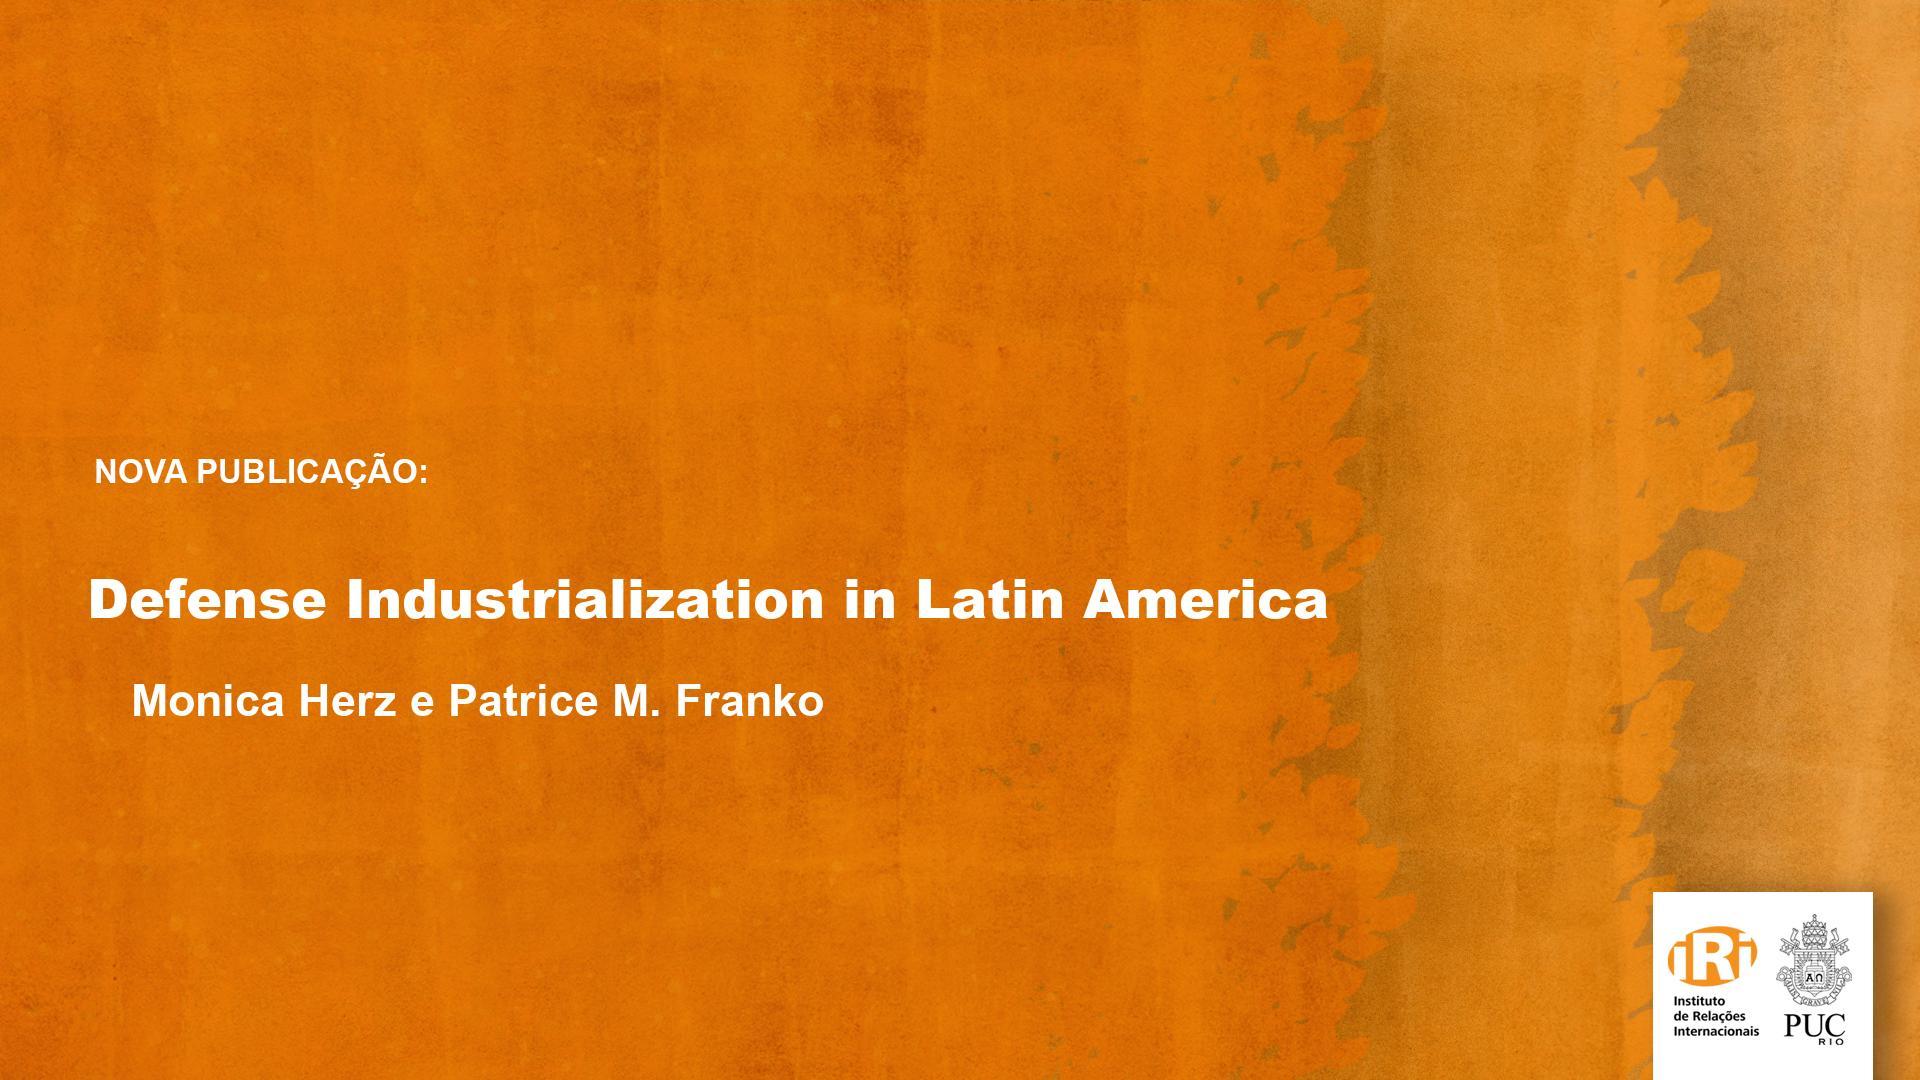 Defense industrialization in Latin America